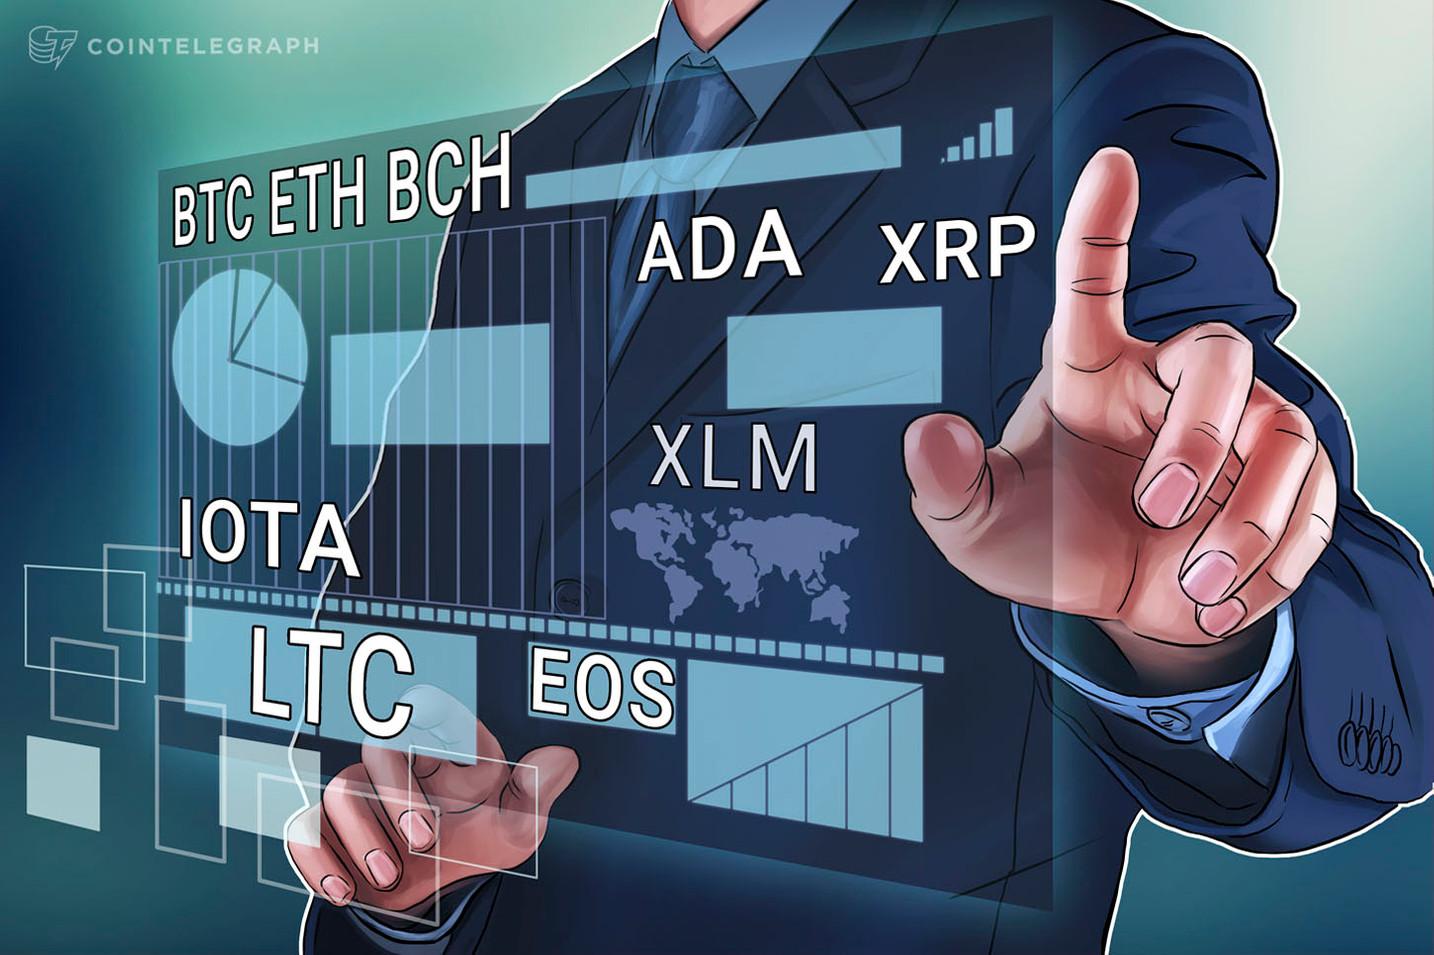 Kursanalyse, 11. Mai: Bitcoin, Ethereum, Bitcoin Cash, Ripple, Stellar, Litecoin, Cardano, IOTA, EOS